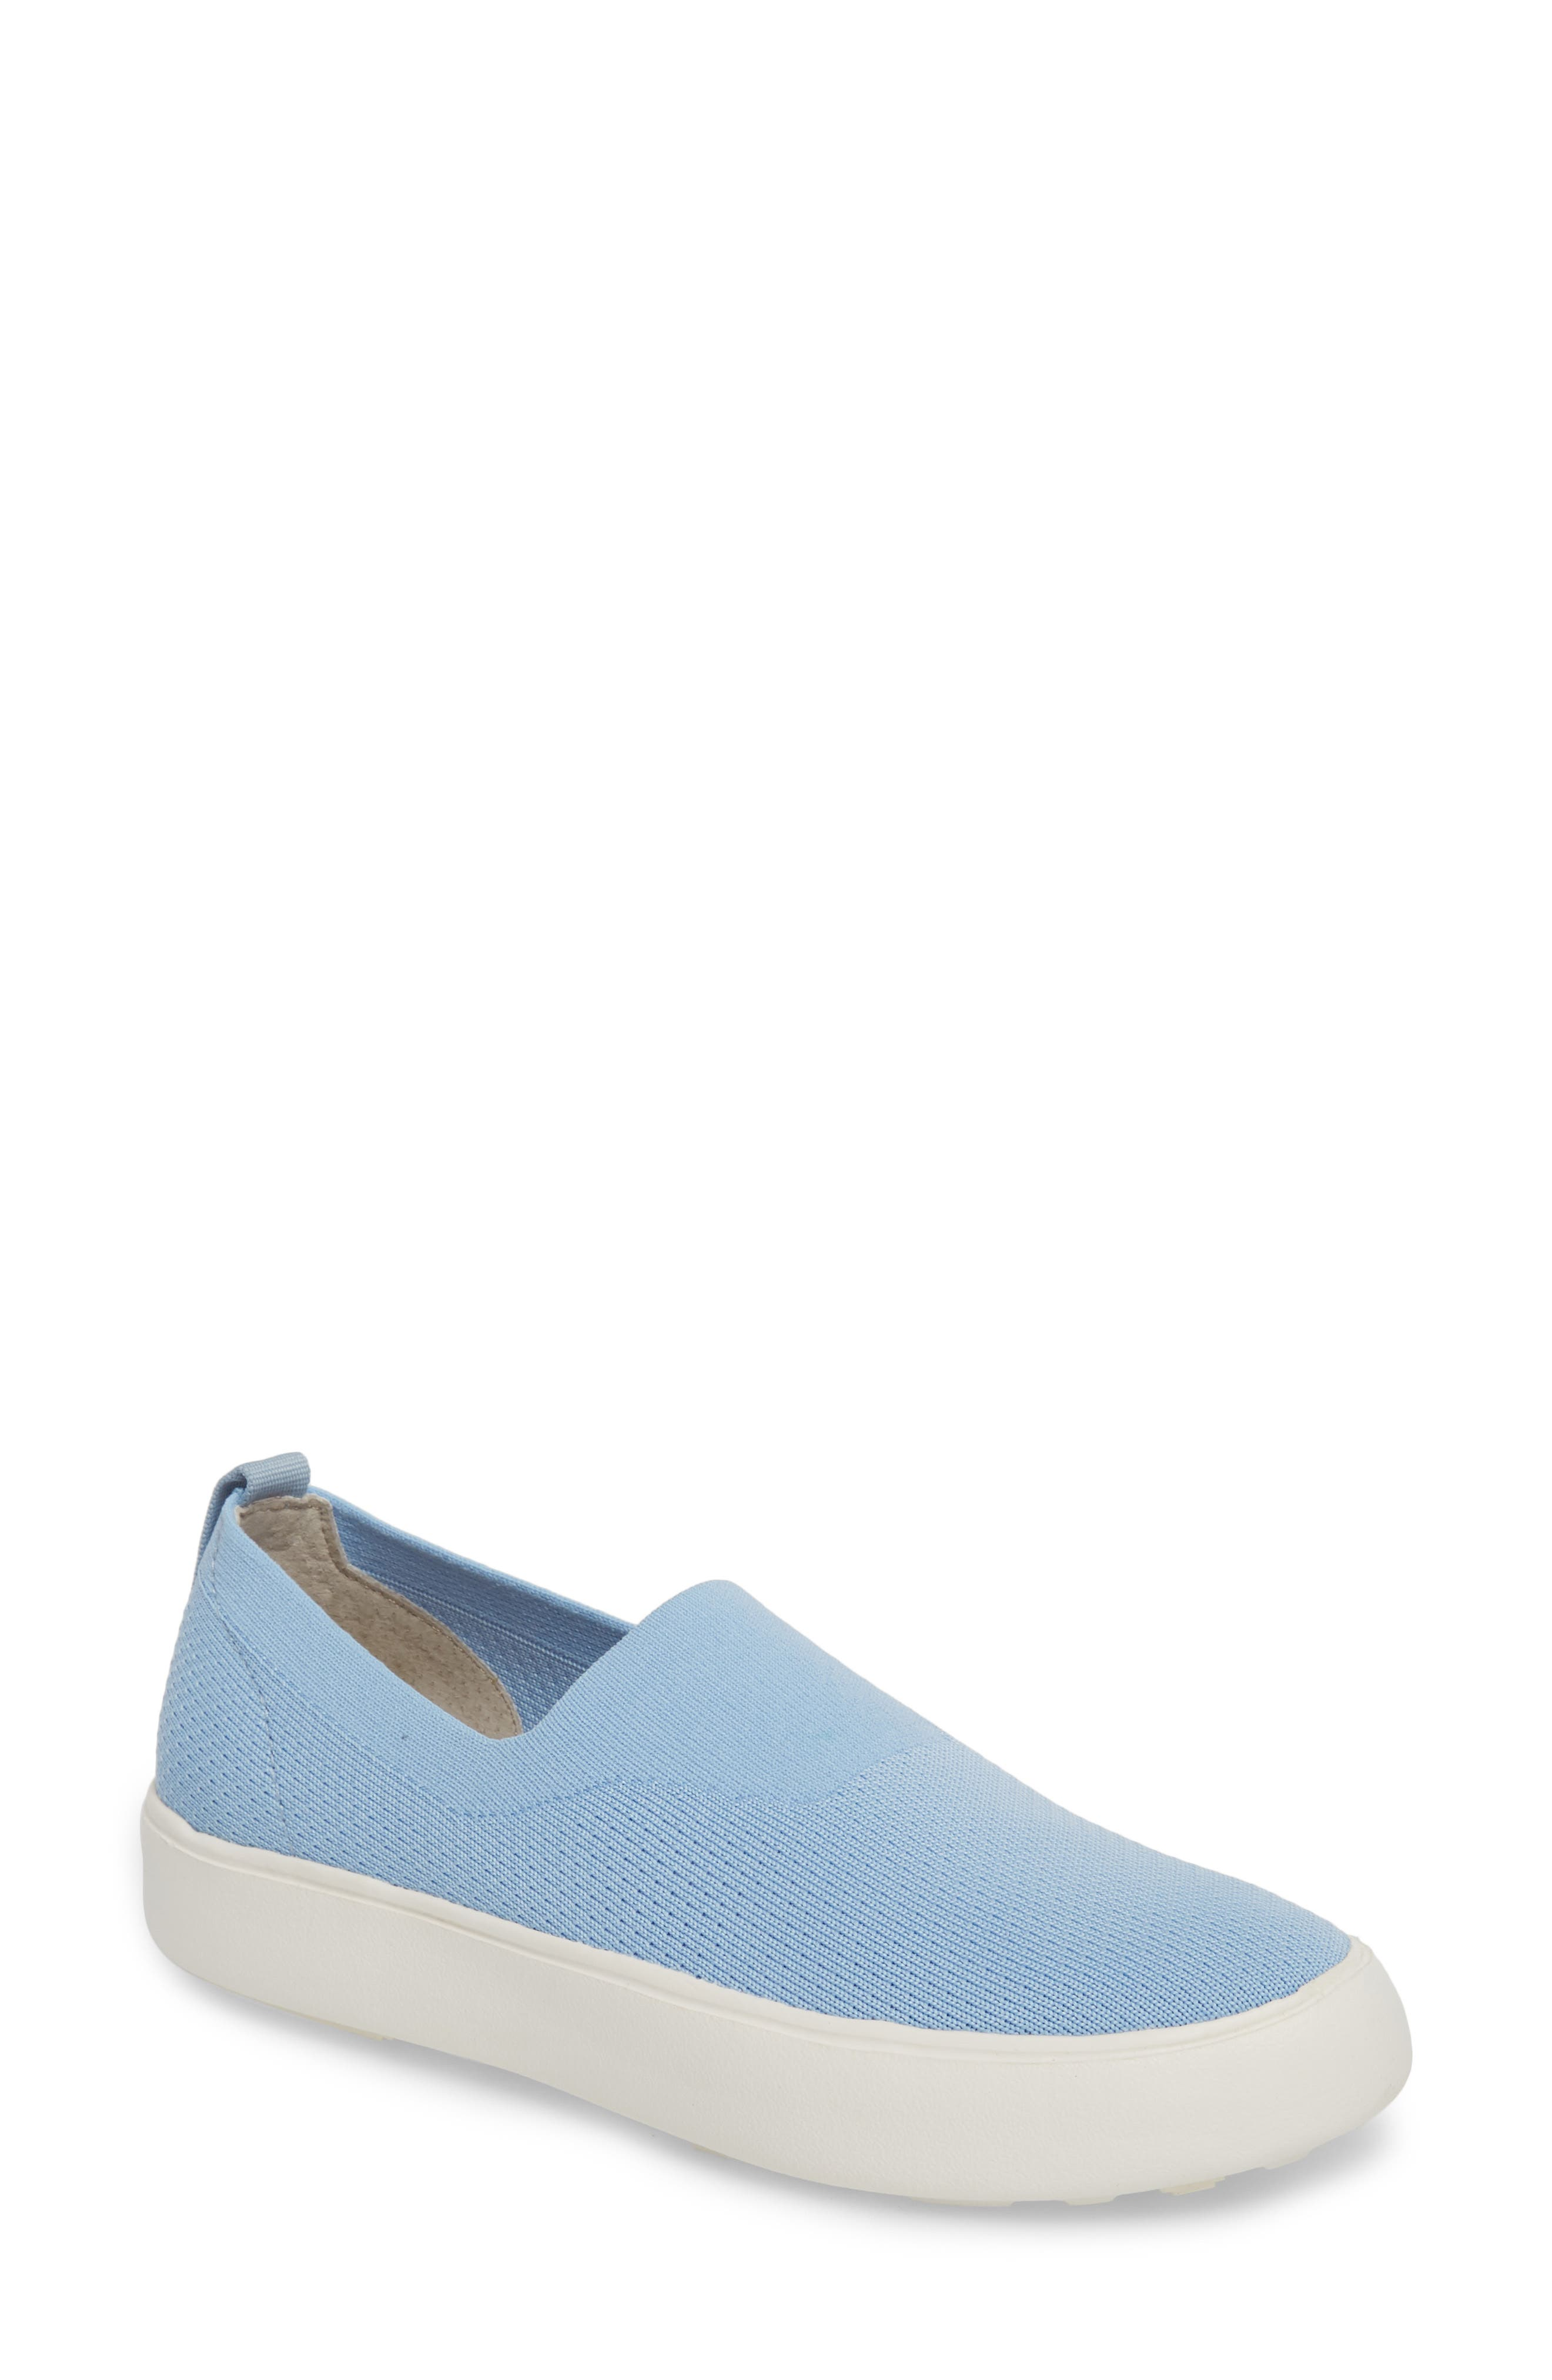 Hula Slip-On Sneaker,                         Main,                         color, Fog Blue